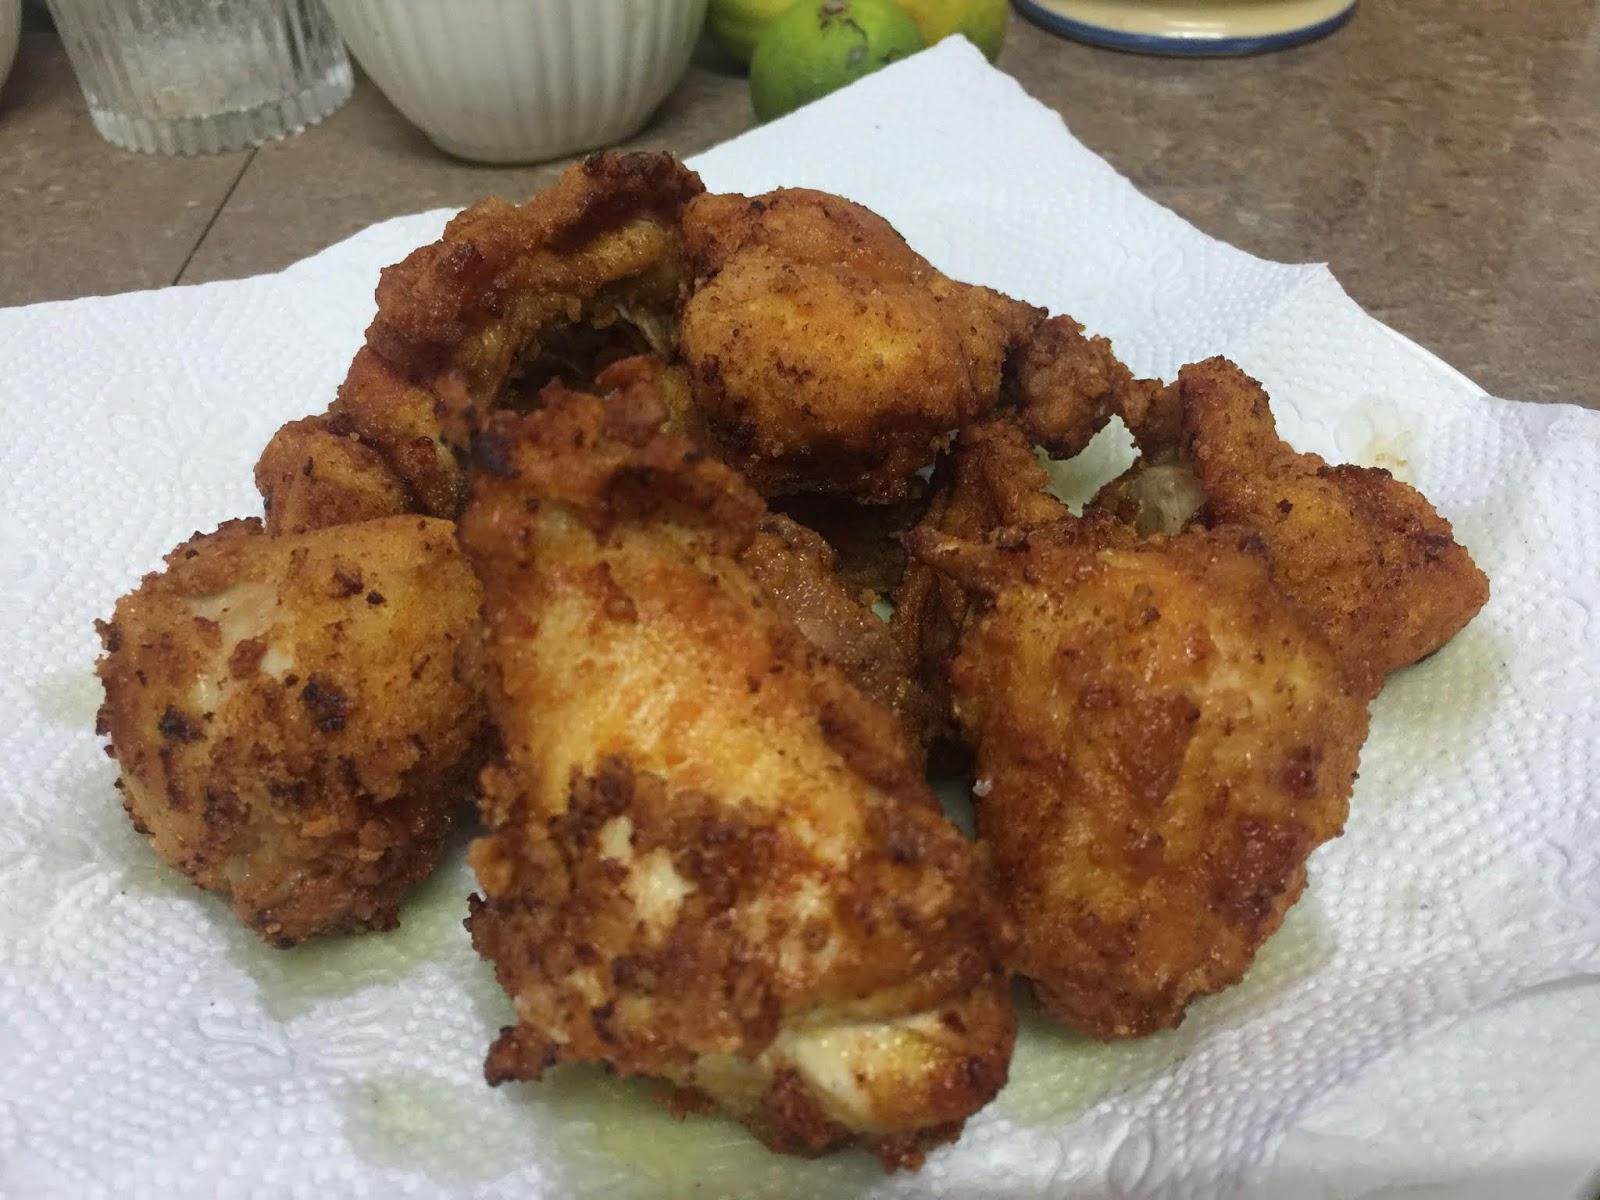 masak mudah, ayam goreng sedap, ayam goreng kfc